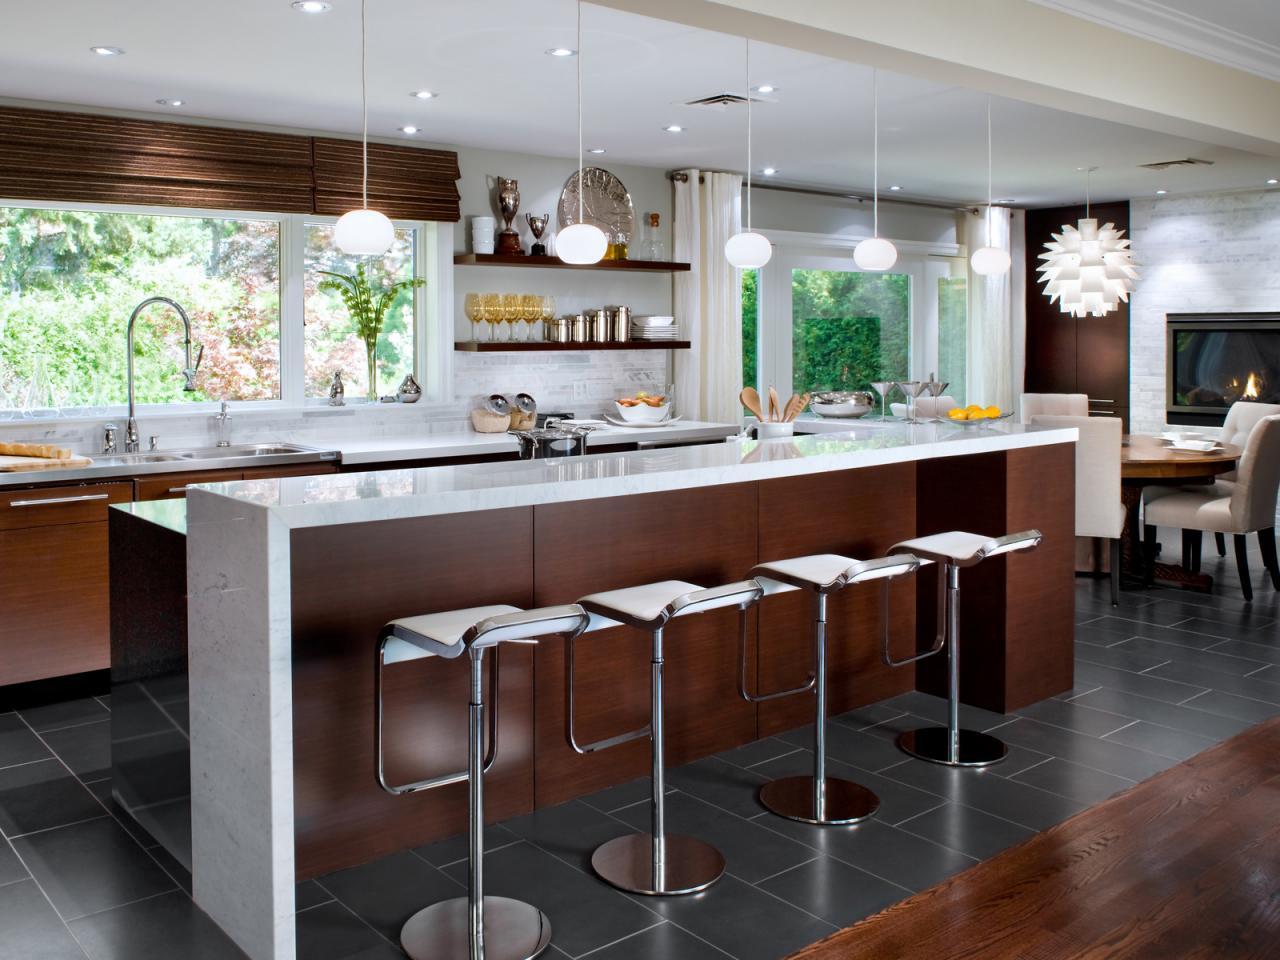 candice-olson-kitchen-design-pictures-photo-12